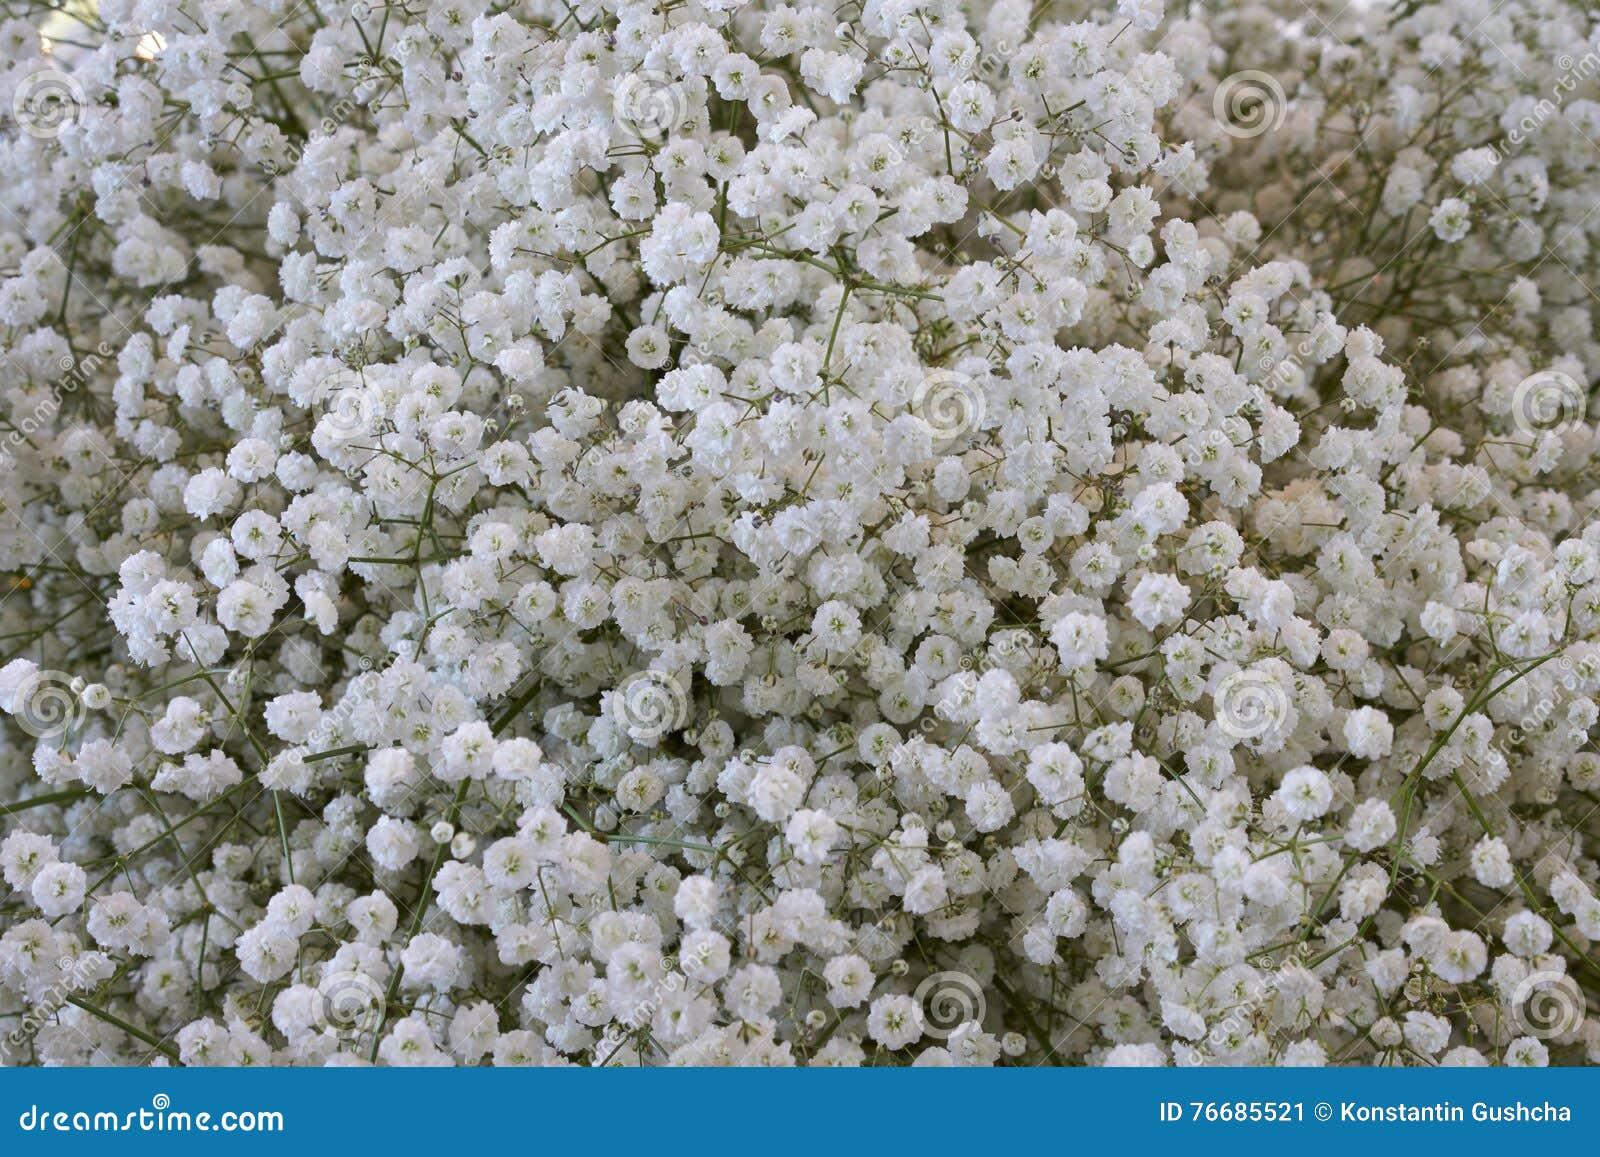 White Gypsophila Flowers Stock Image Image Of Bunch 76685521